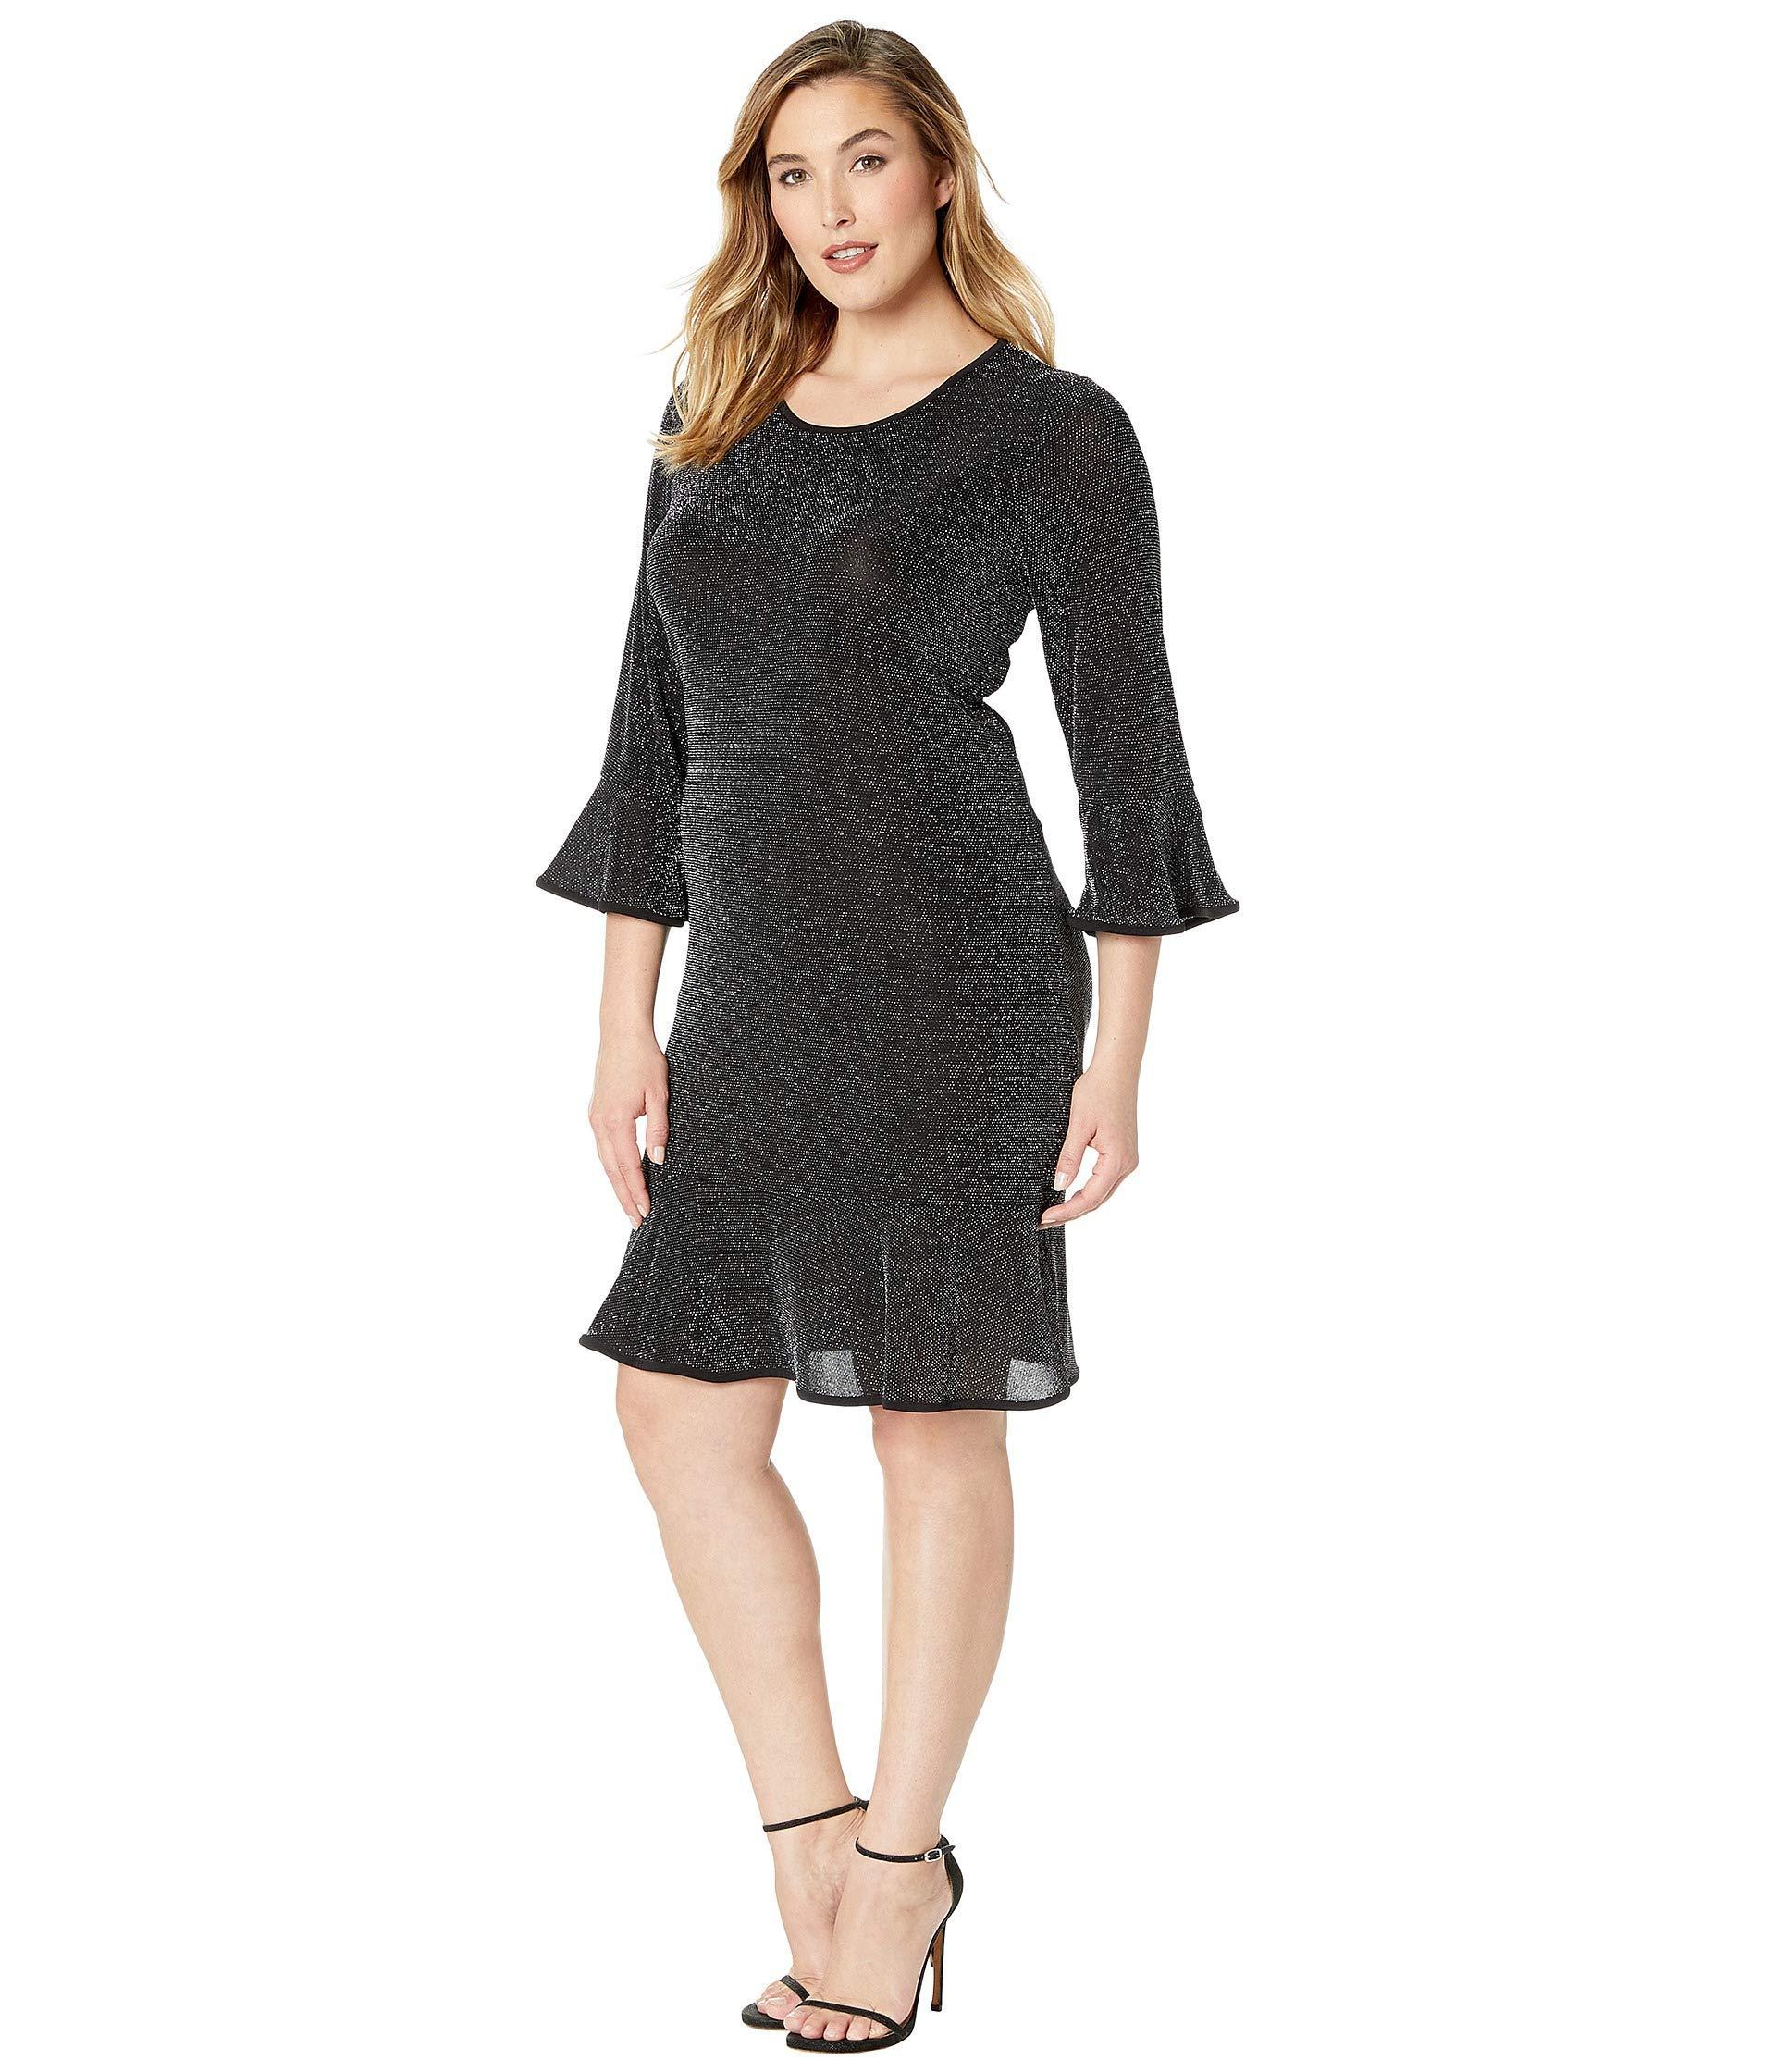 0eb795a498870 Lyst - MICHAEL Michael Kors Plus Size Flounce Sleeve Dress in Black - Save  13%